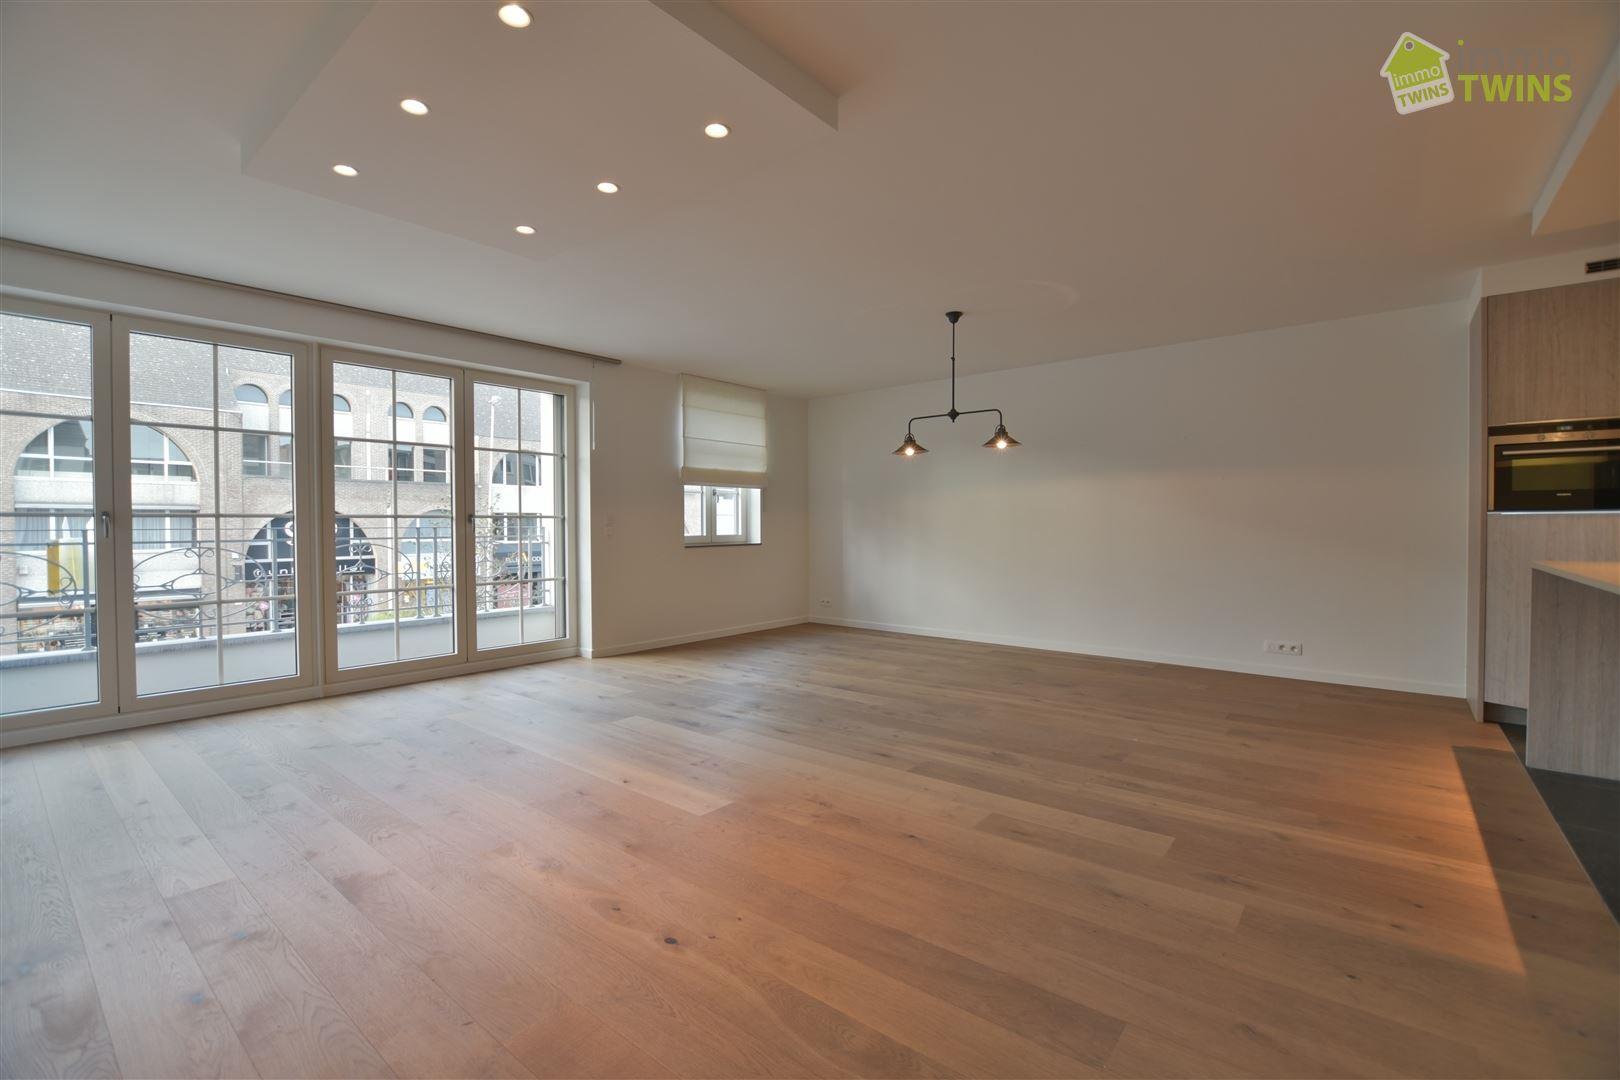 Foto 2 : Appartement te 9200 DENDERMONDE (België) - Prijs € 1.100